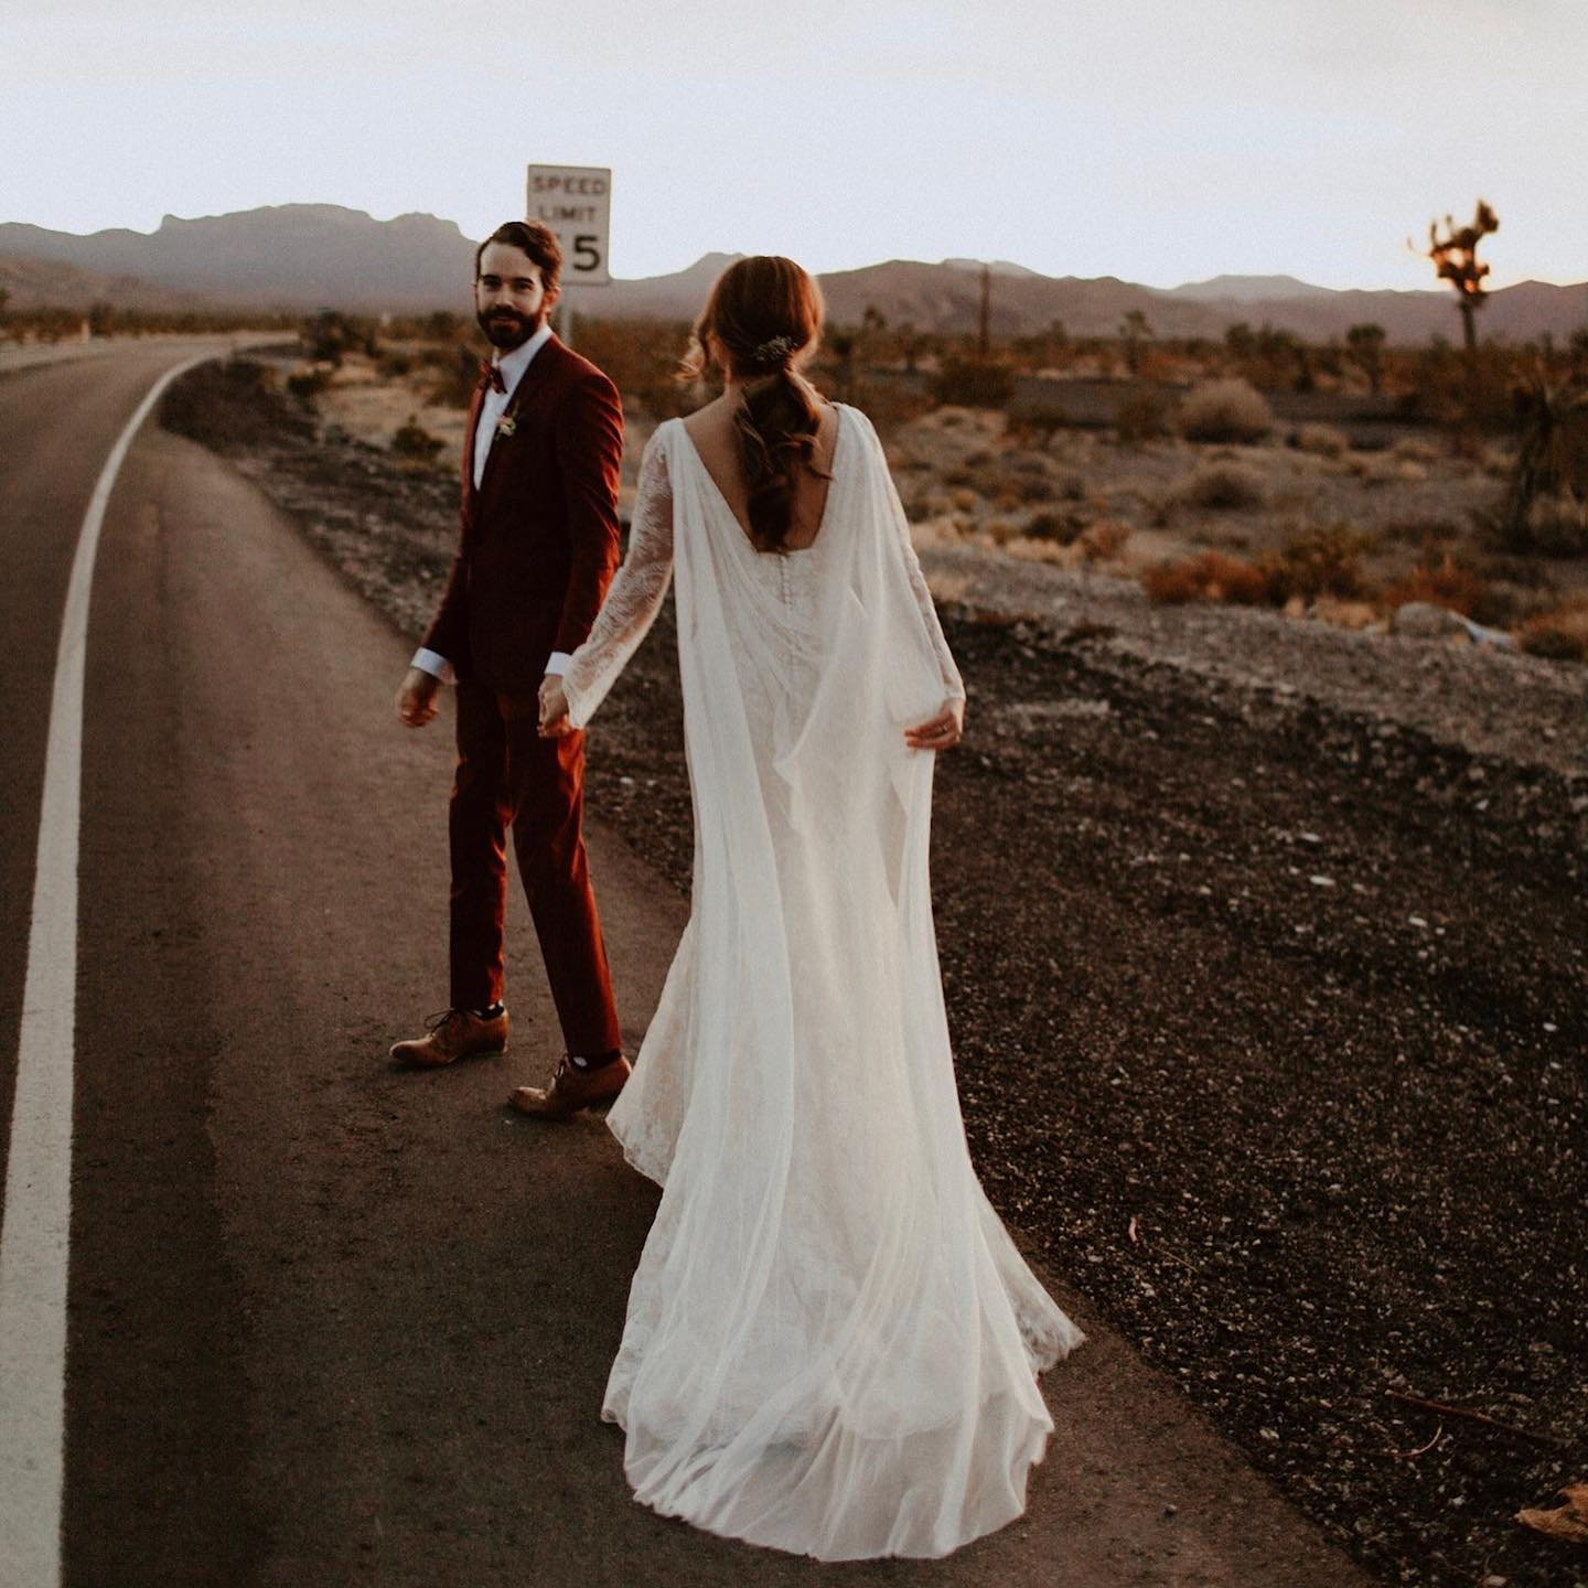 long wedding cape silk bride and groom in street